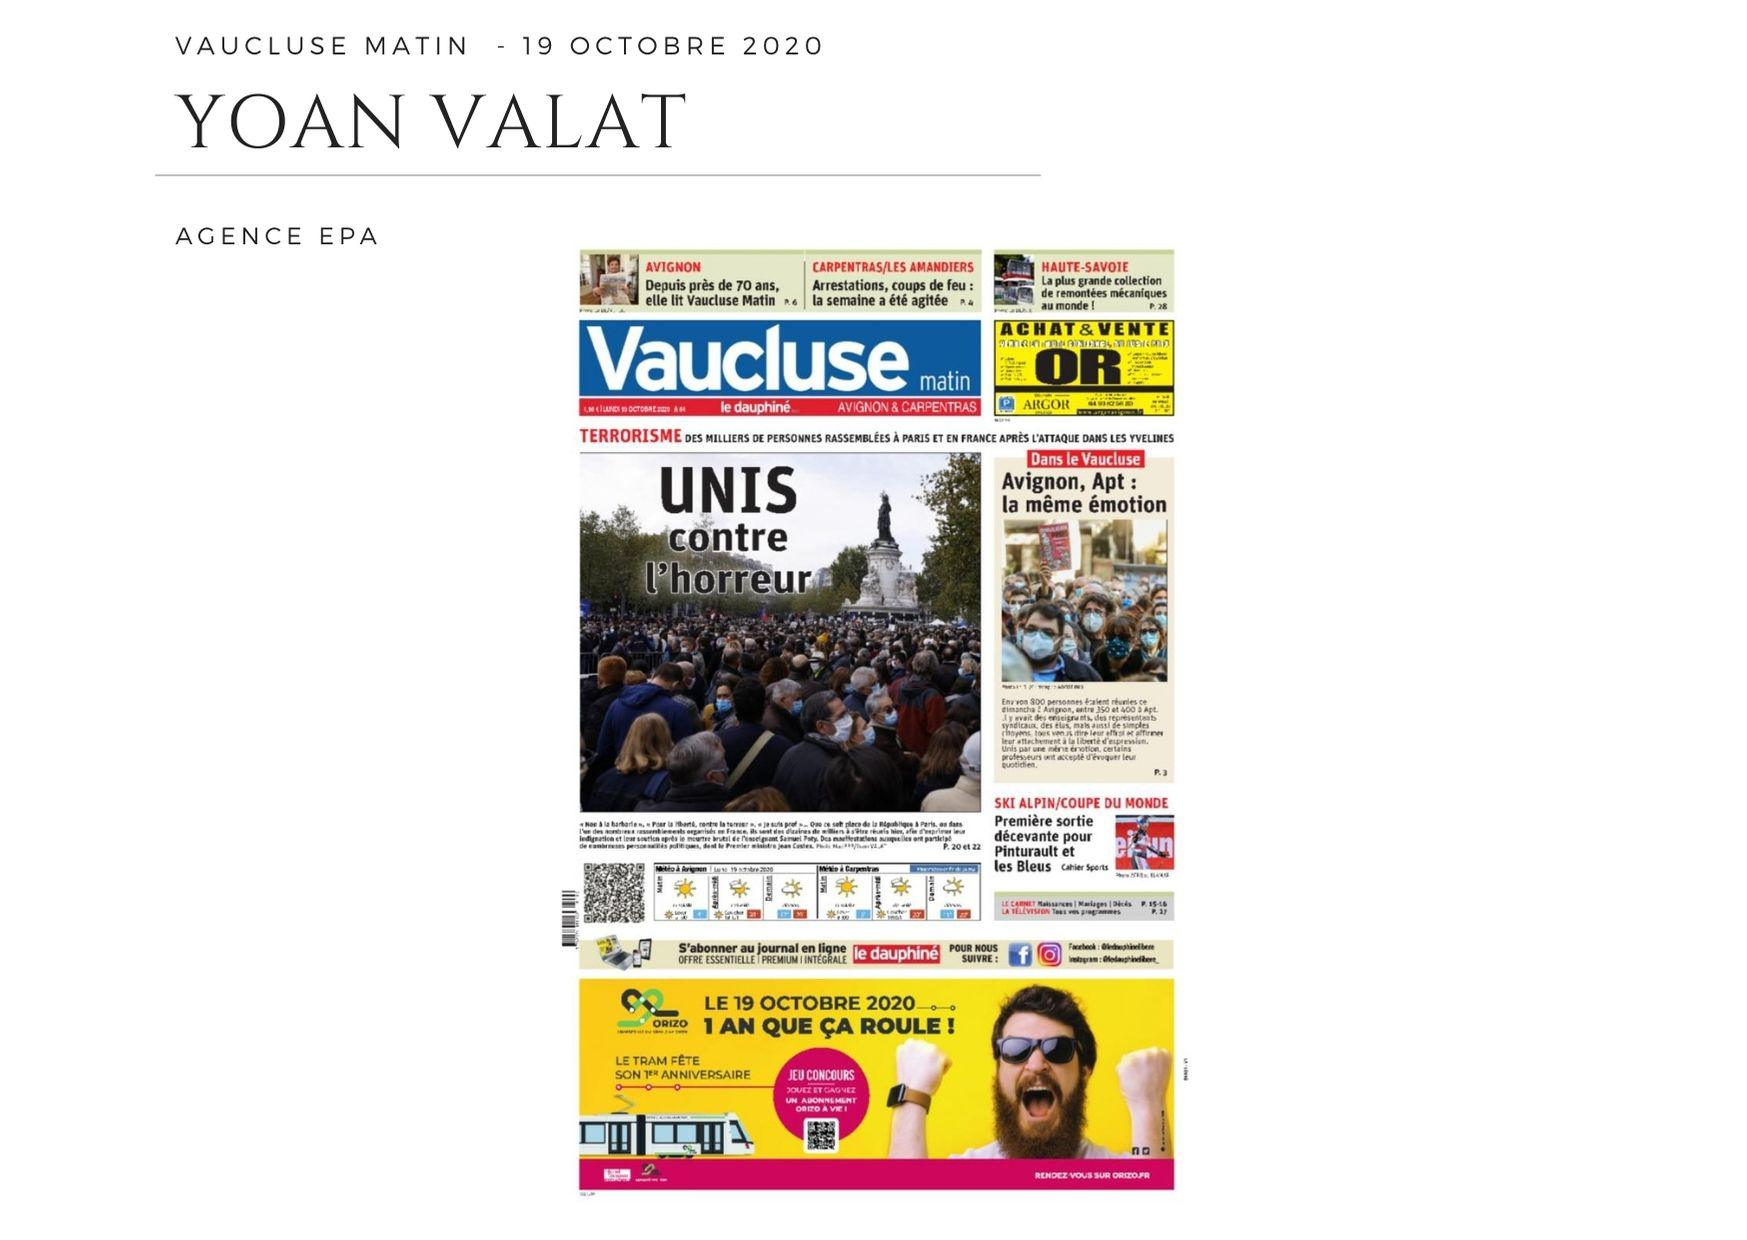 Vaucluse Matin - 19 octobre 2020